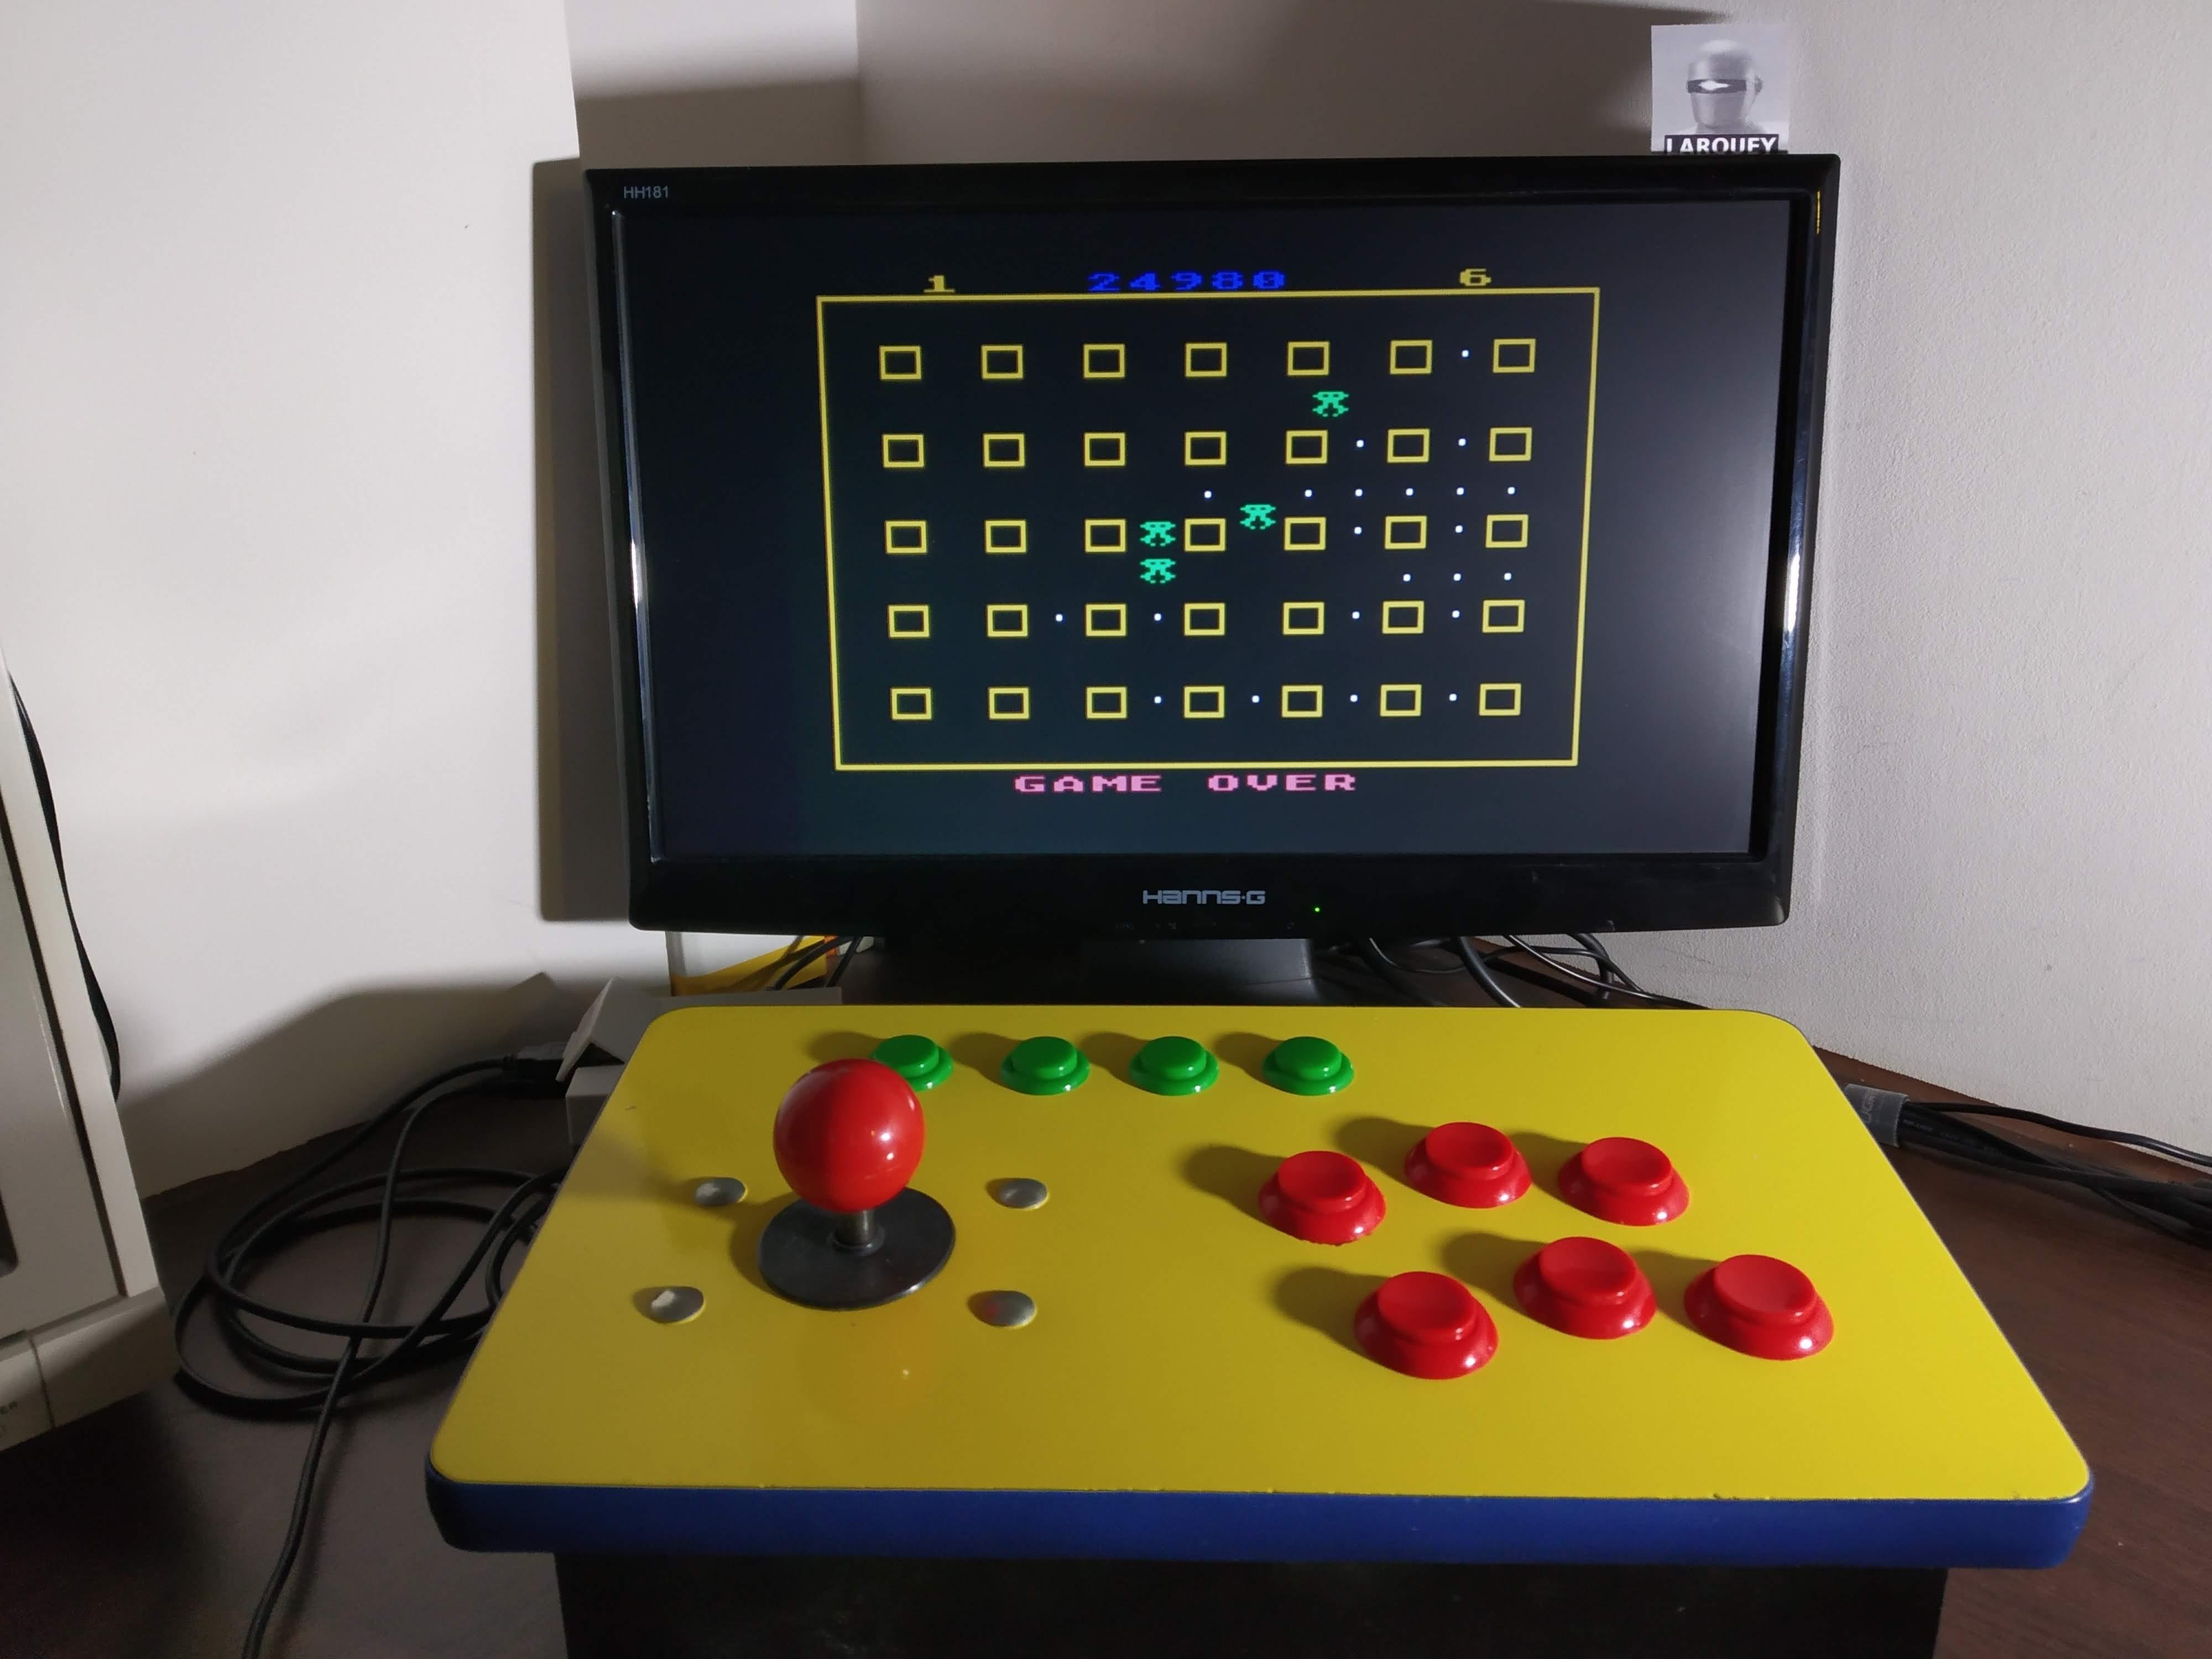 Larquey: Chomper (Atari 400/800/XL/XE Emulated) 24,980 points on 2020-01-05 13:06:12